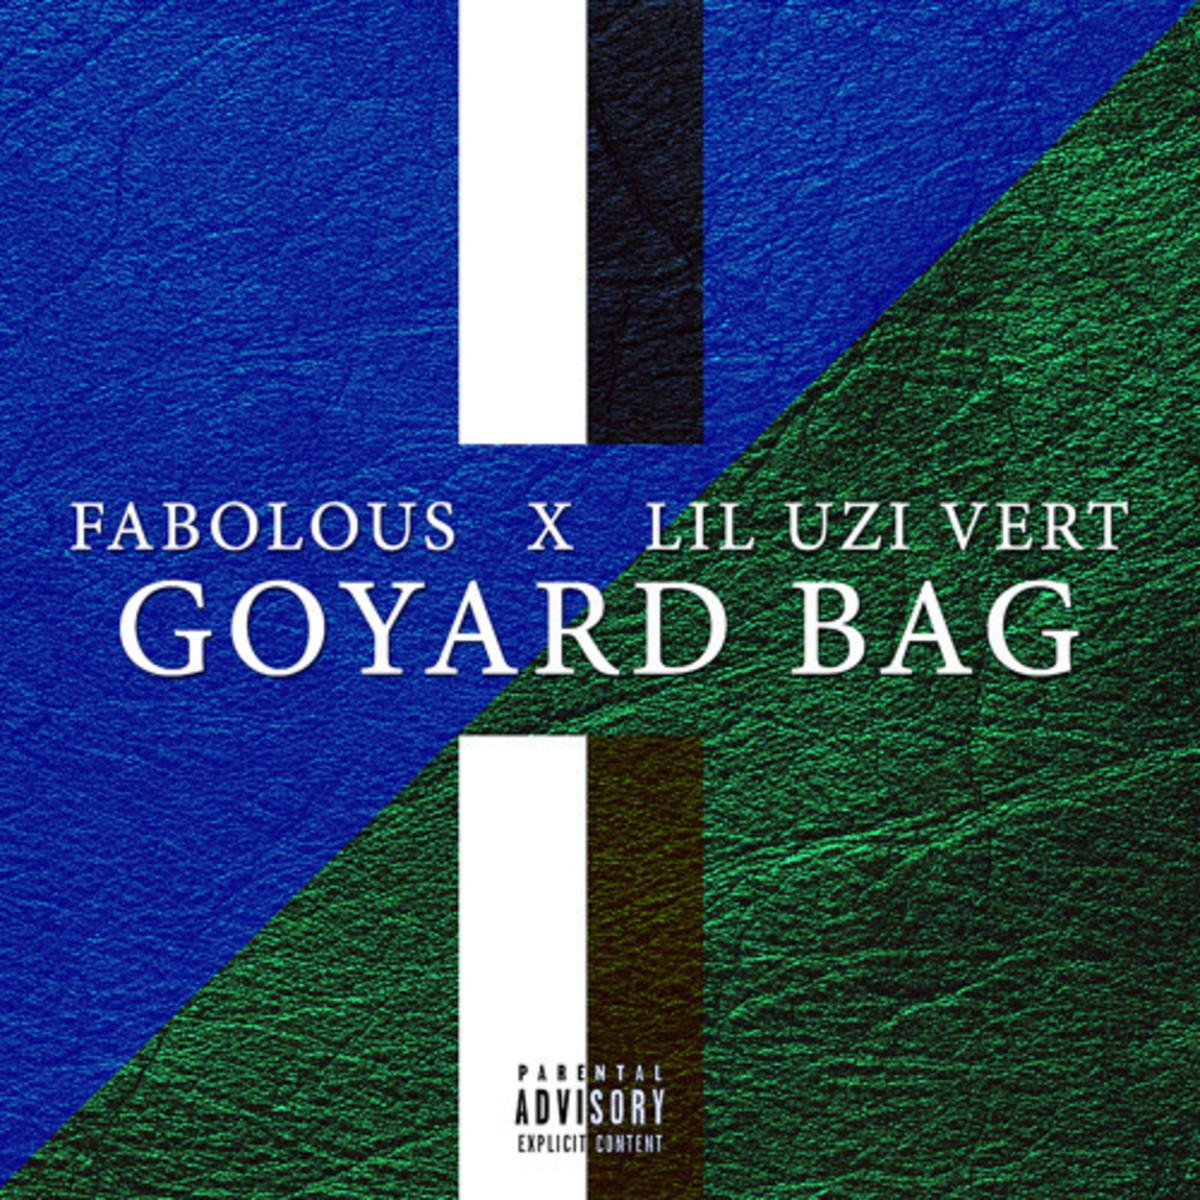 fabolous-goyard-bag.jpg